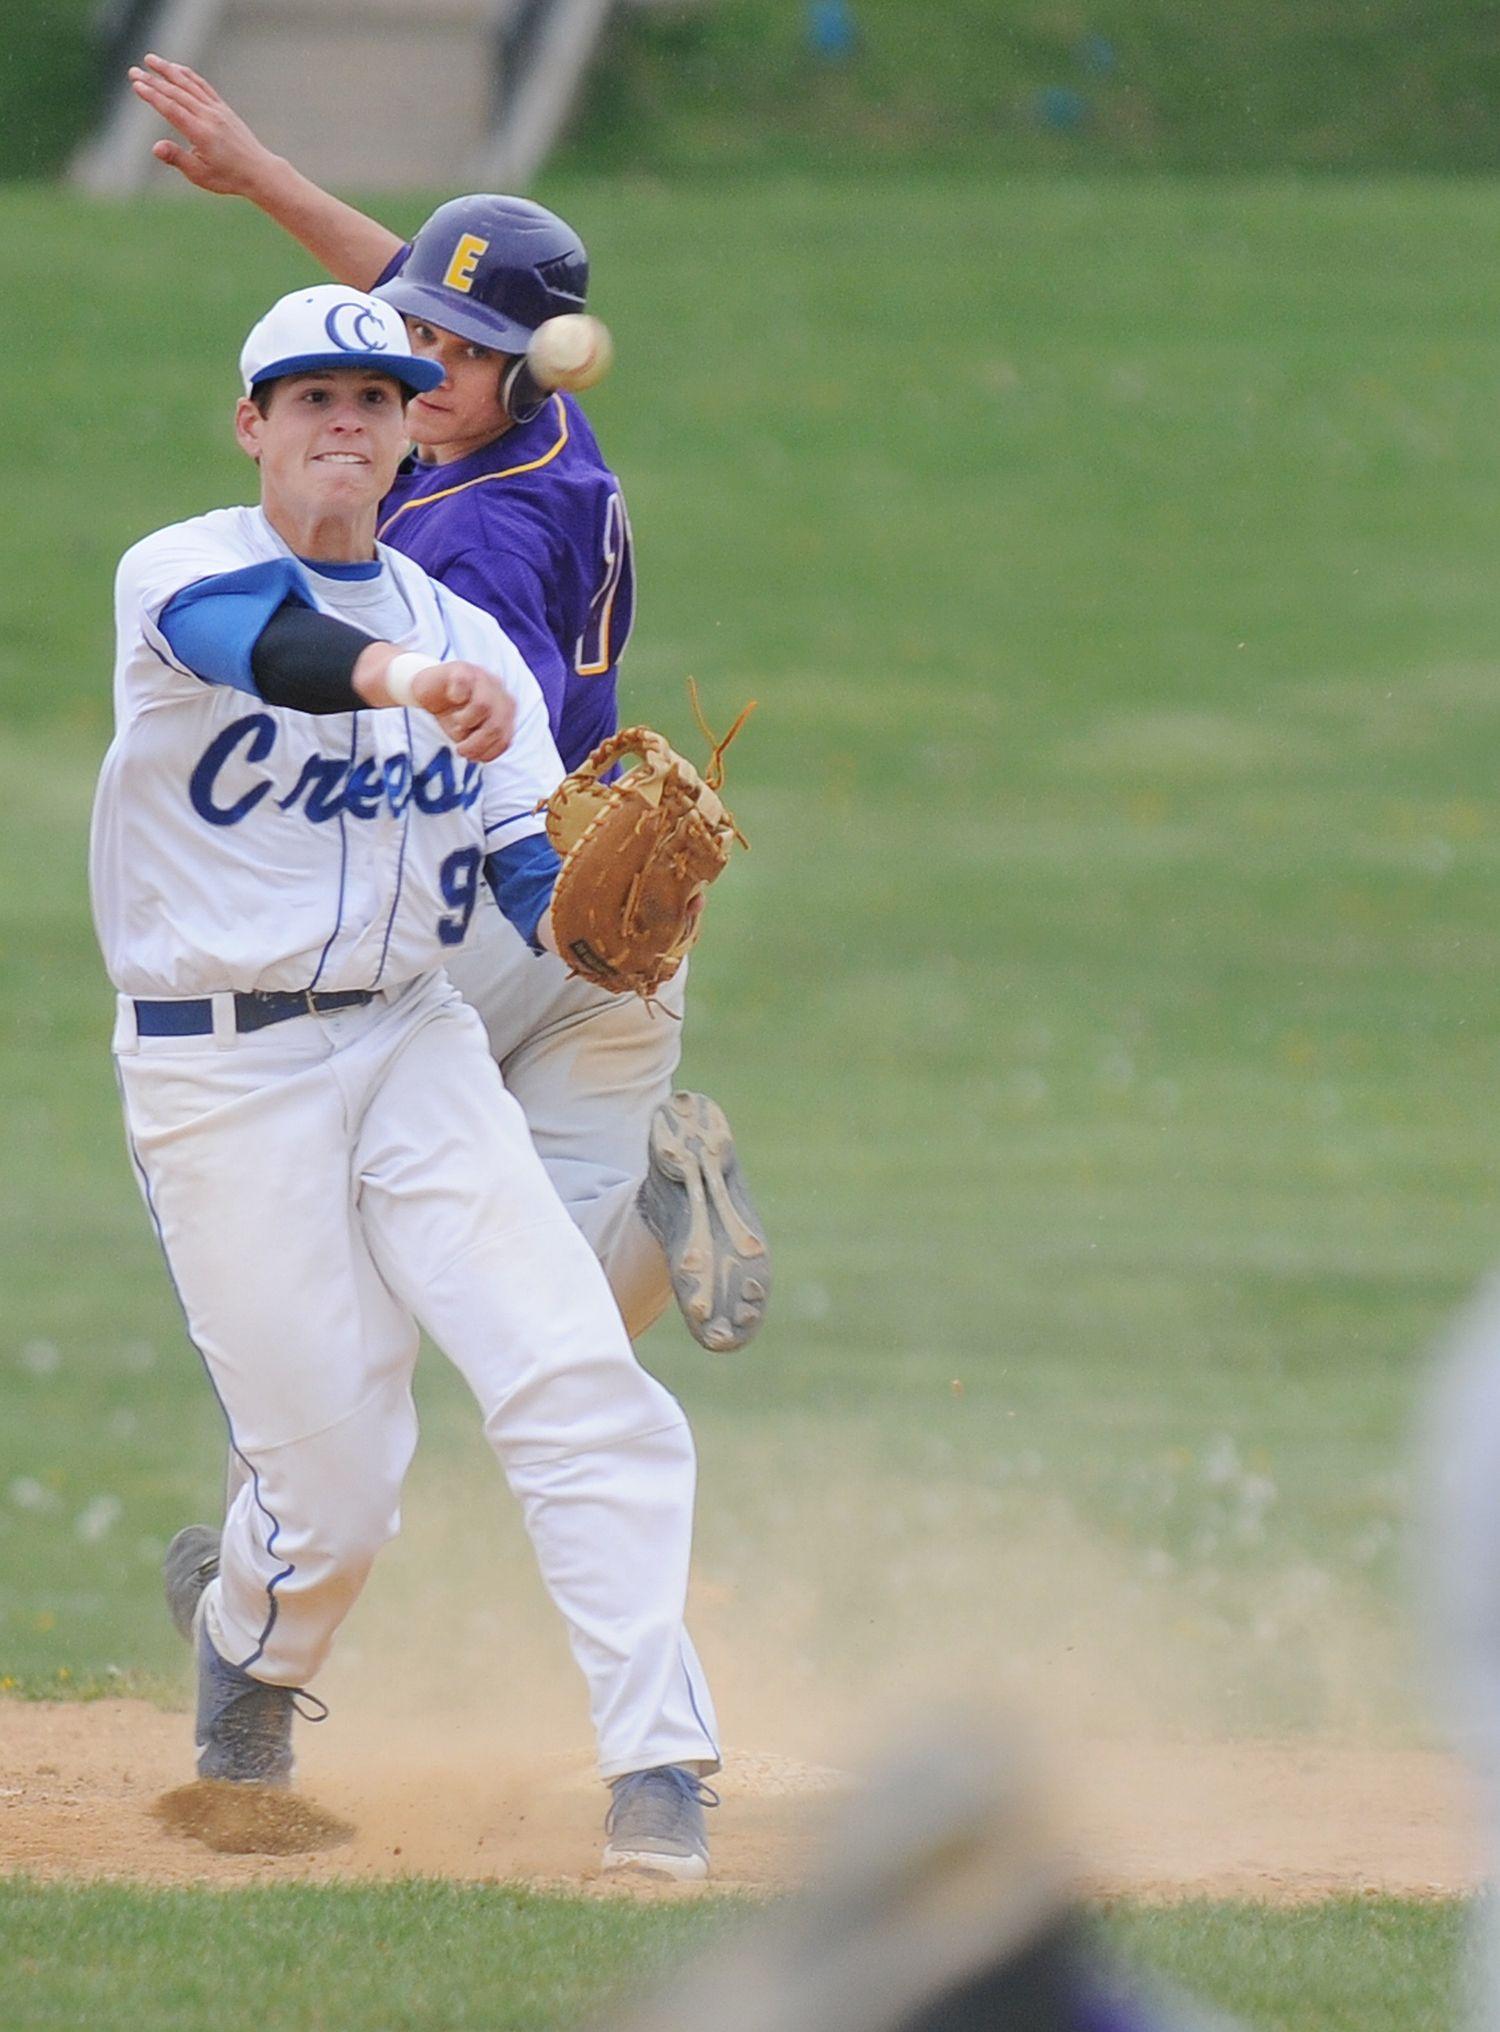 After Making A Play At First Cedar Crest S Garrett Getz Throws The Ball To Home During The Game Against Eph High School Sports High School Baseball Cedar Crest